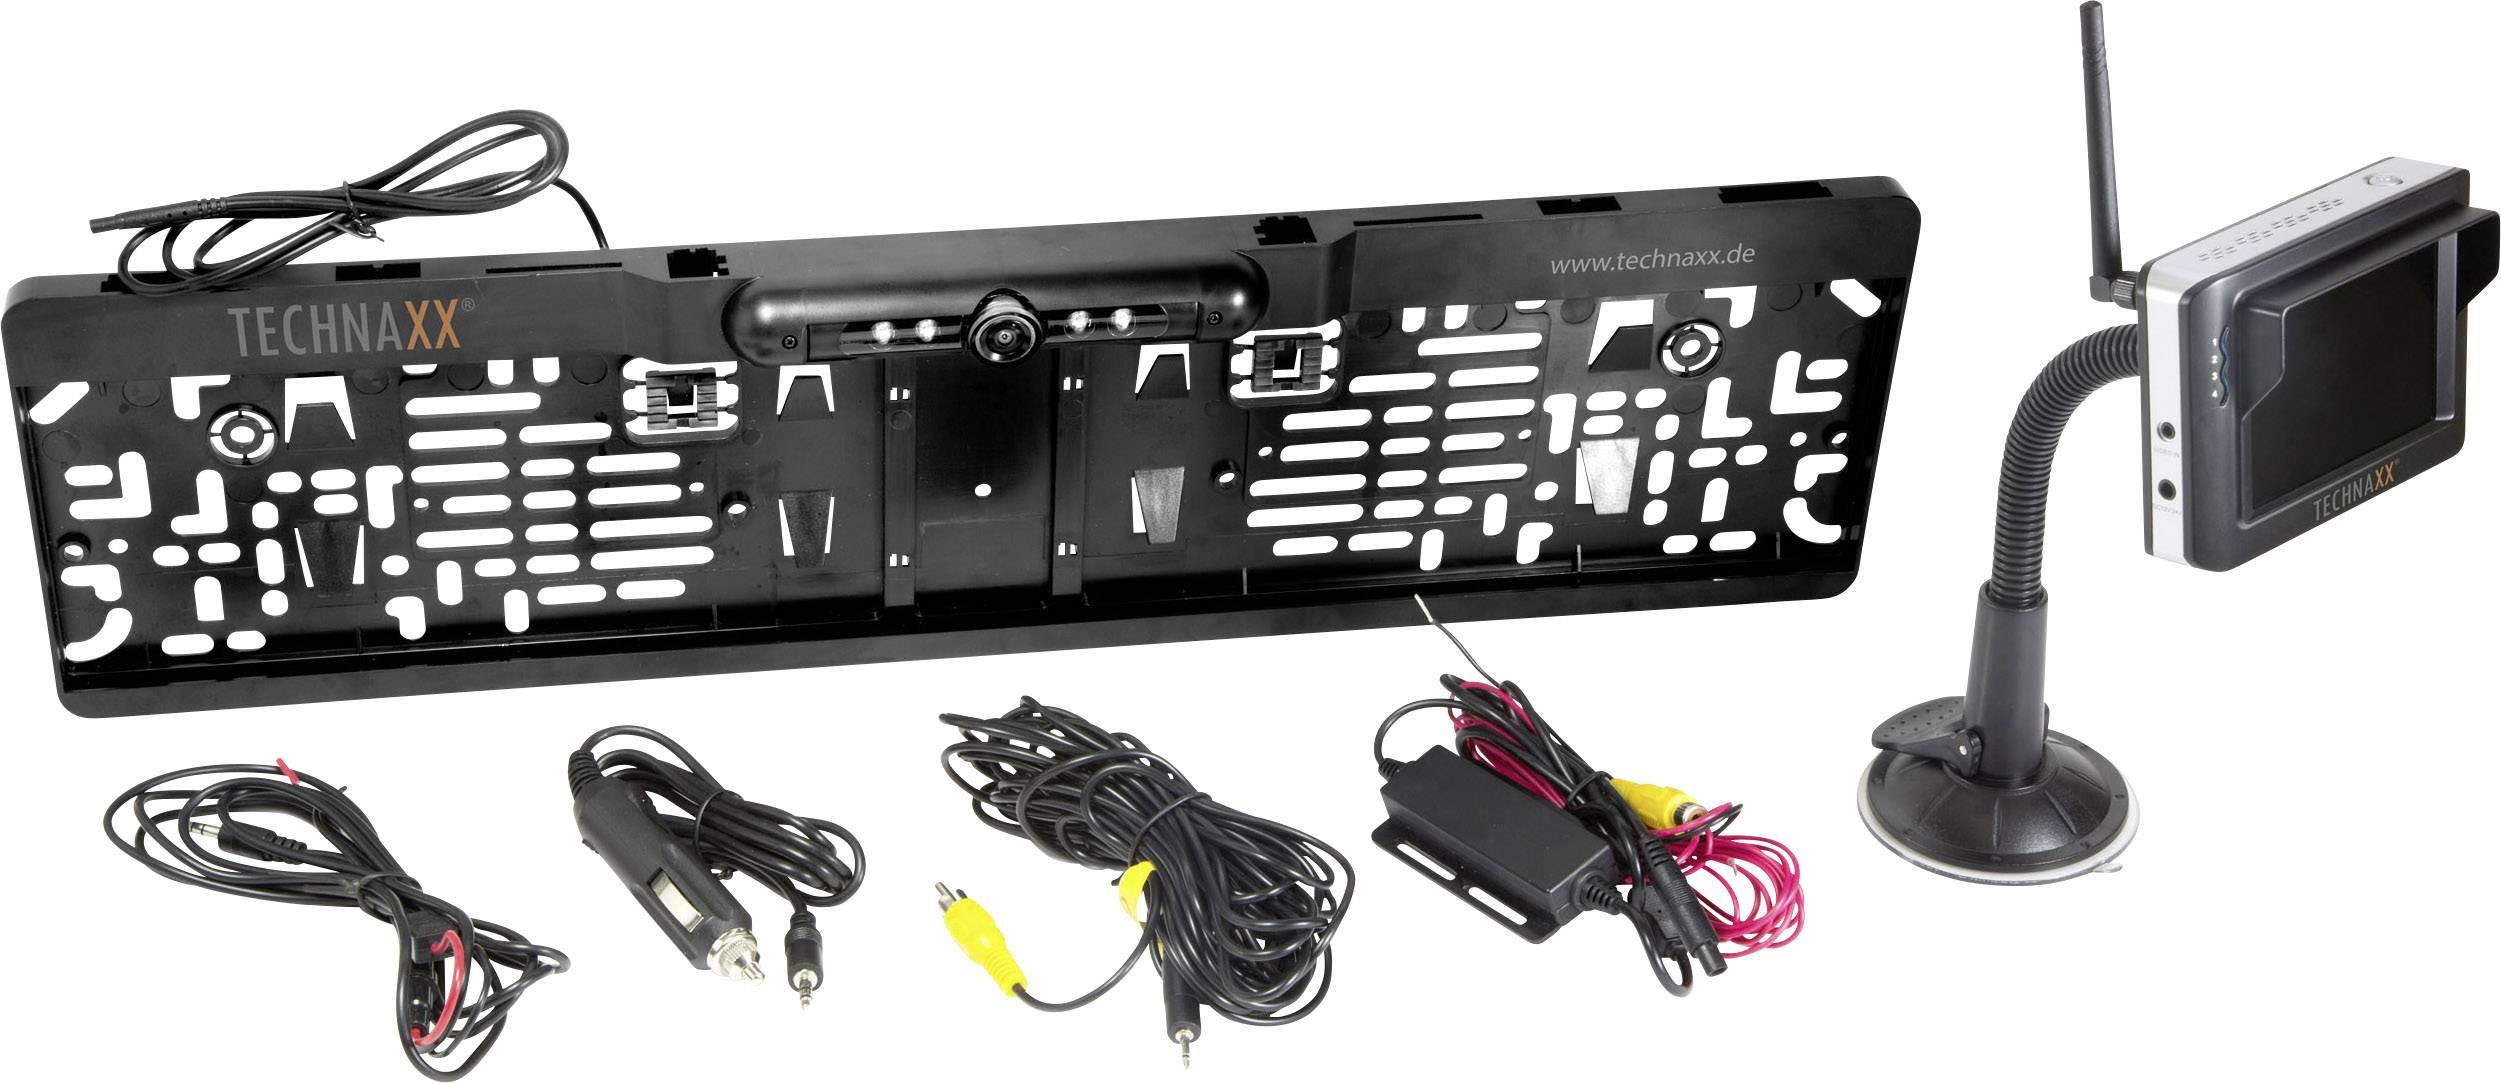 Technaxx TX-110 Sistema video di re